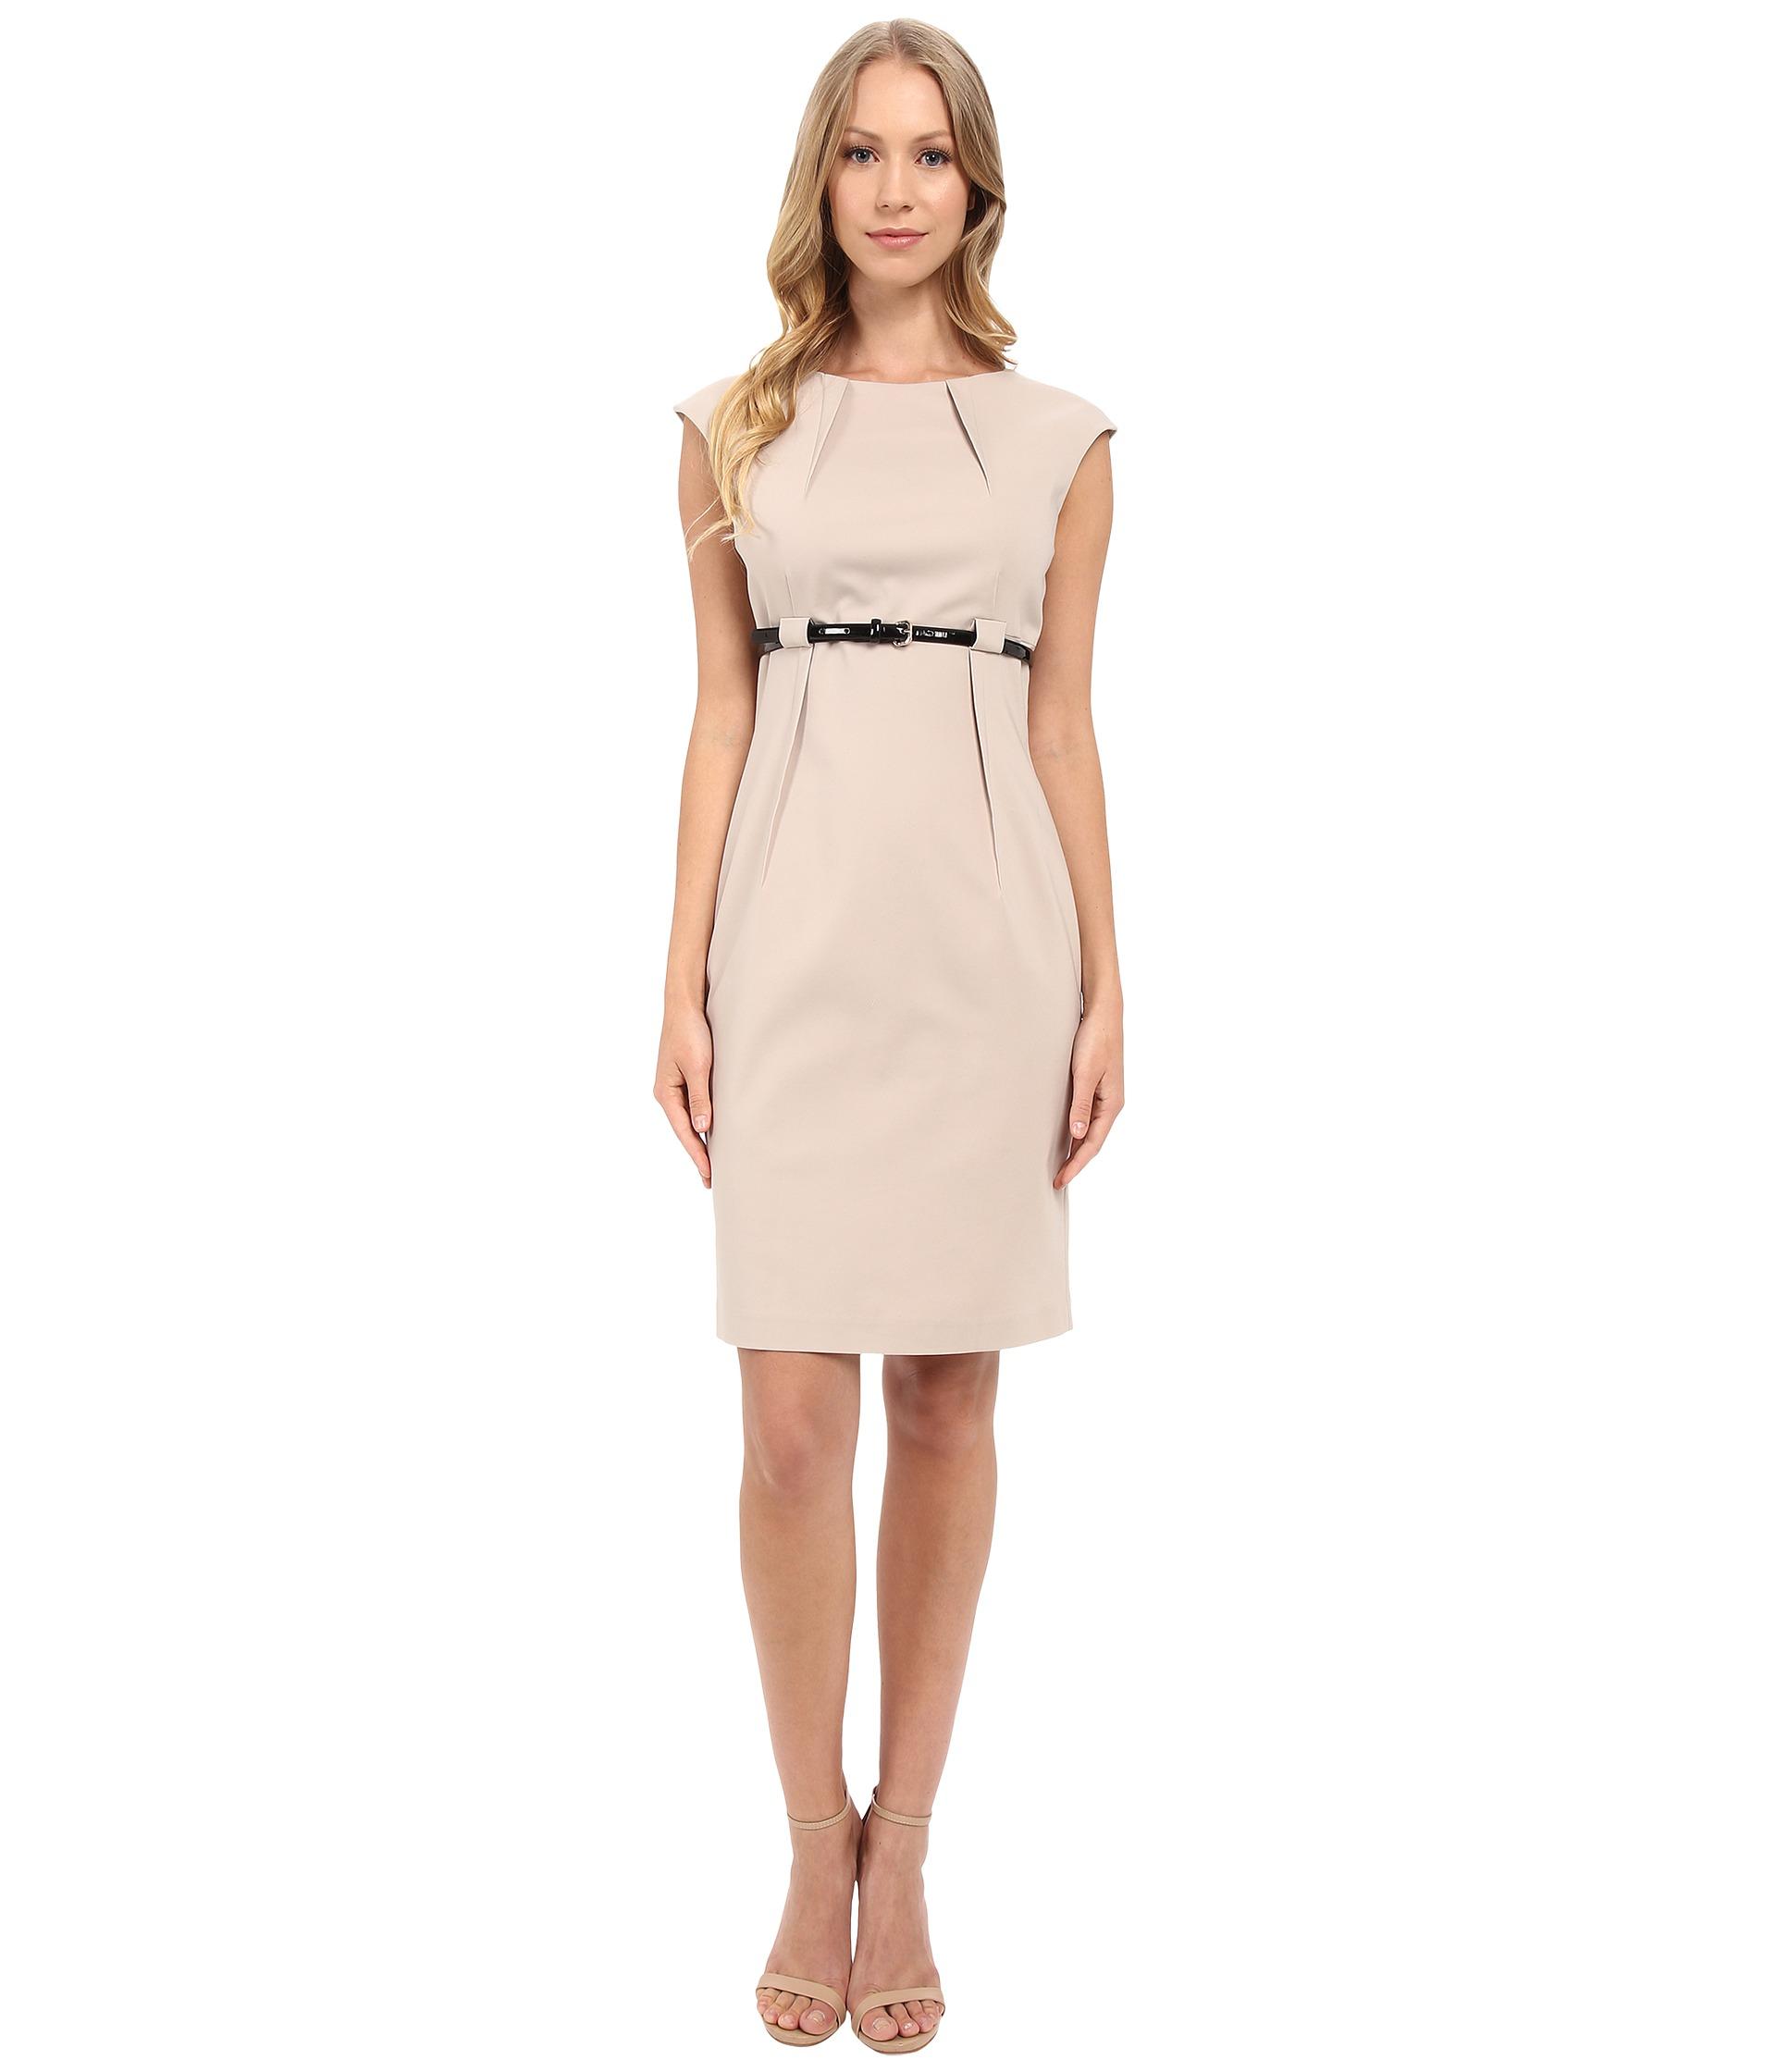 Galerry sheath dress empire waist